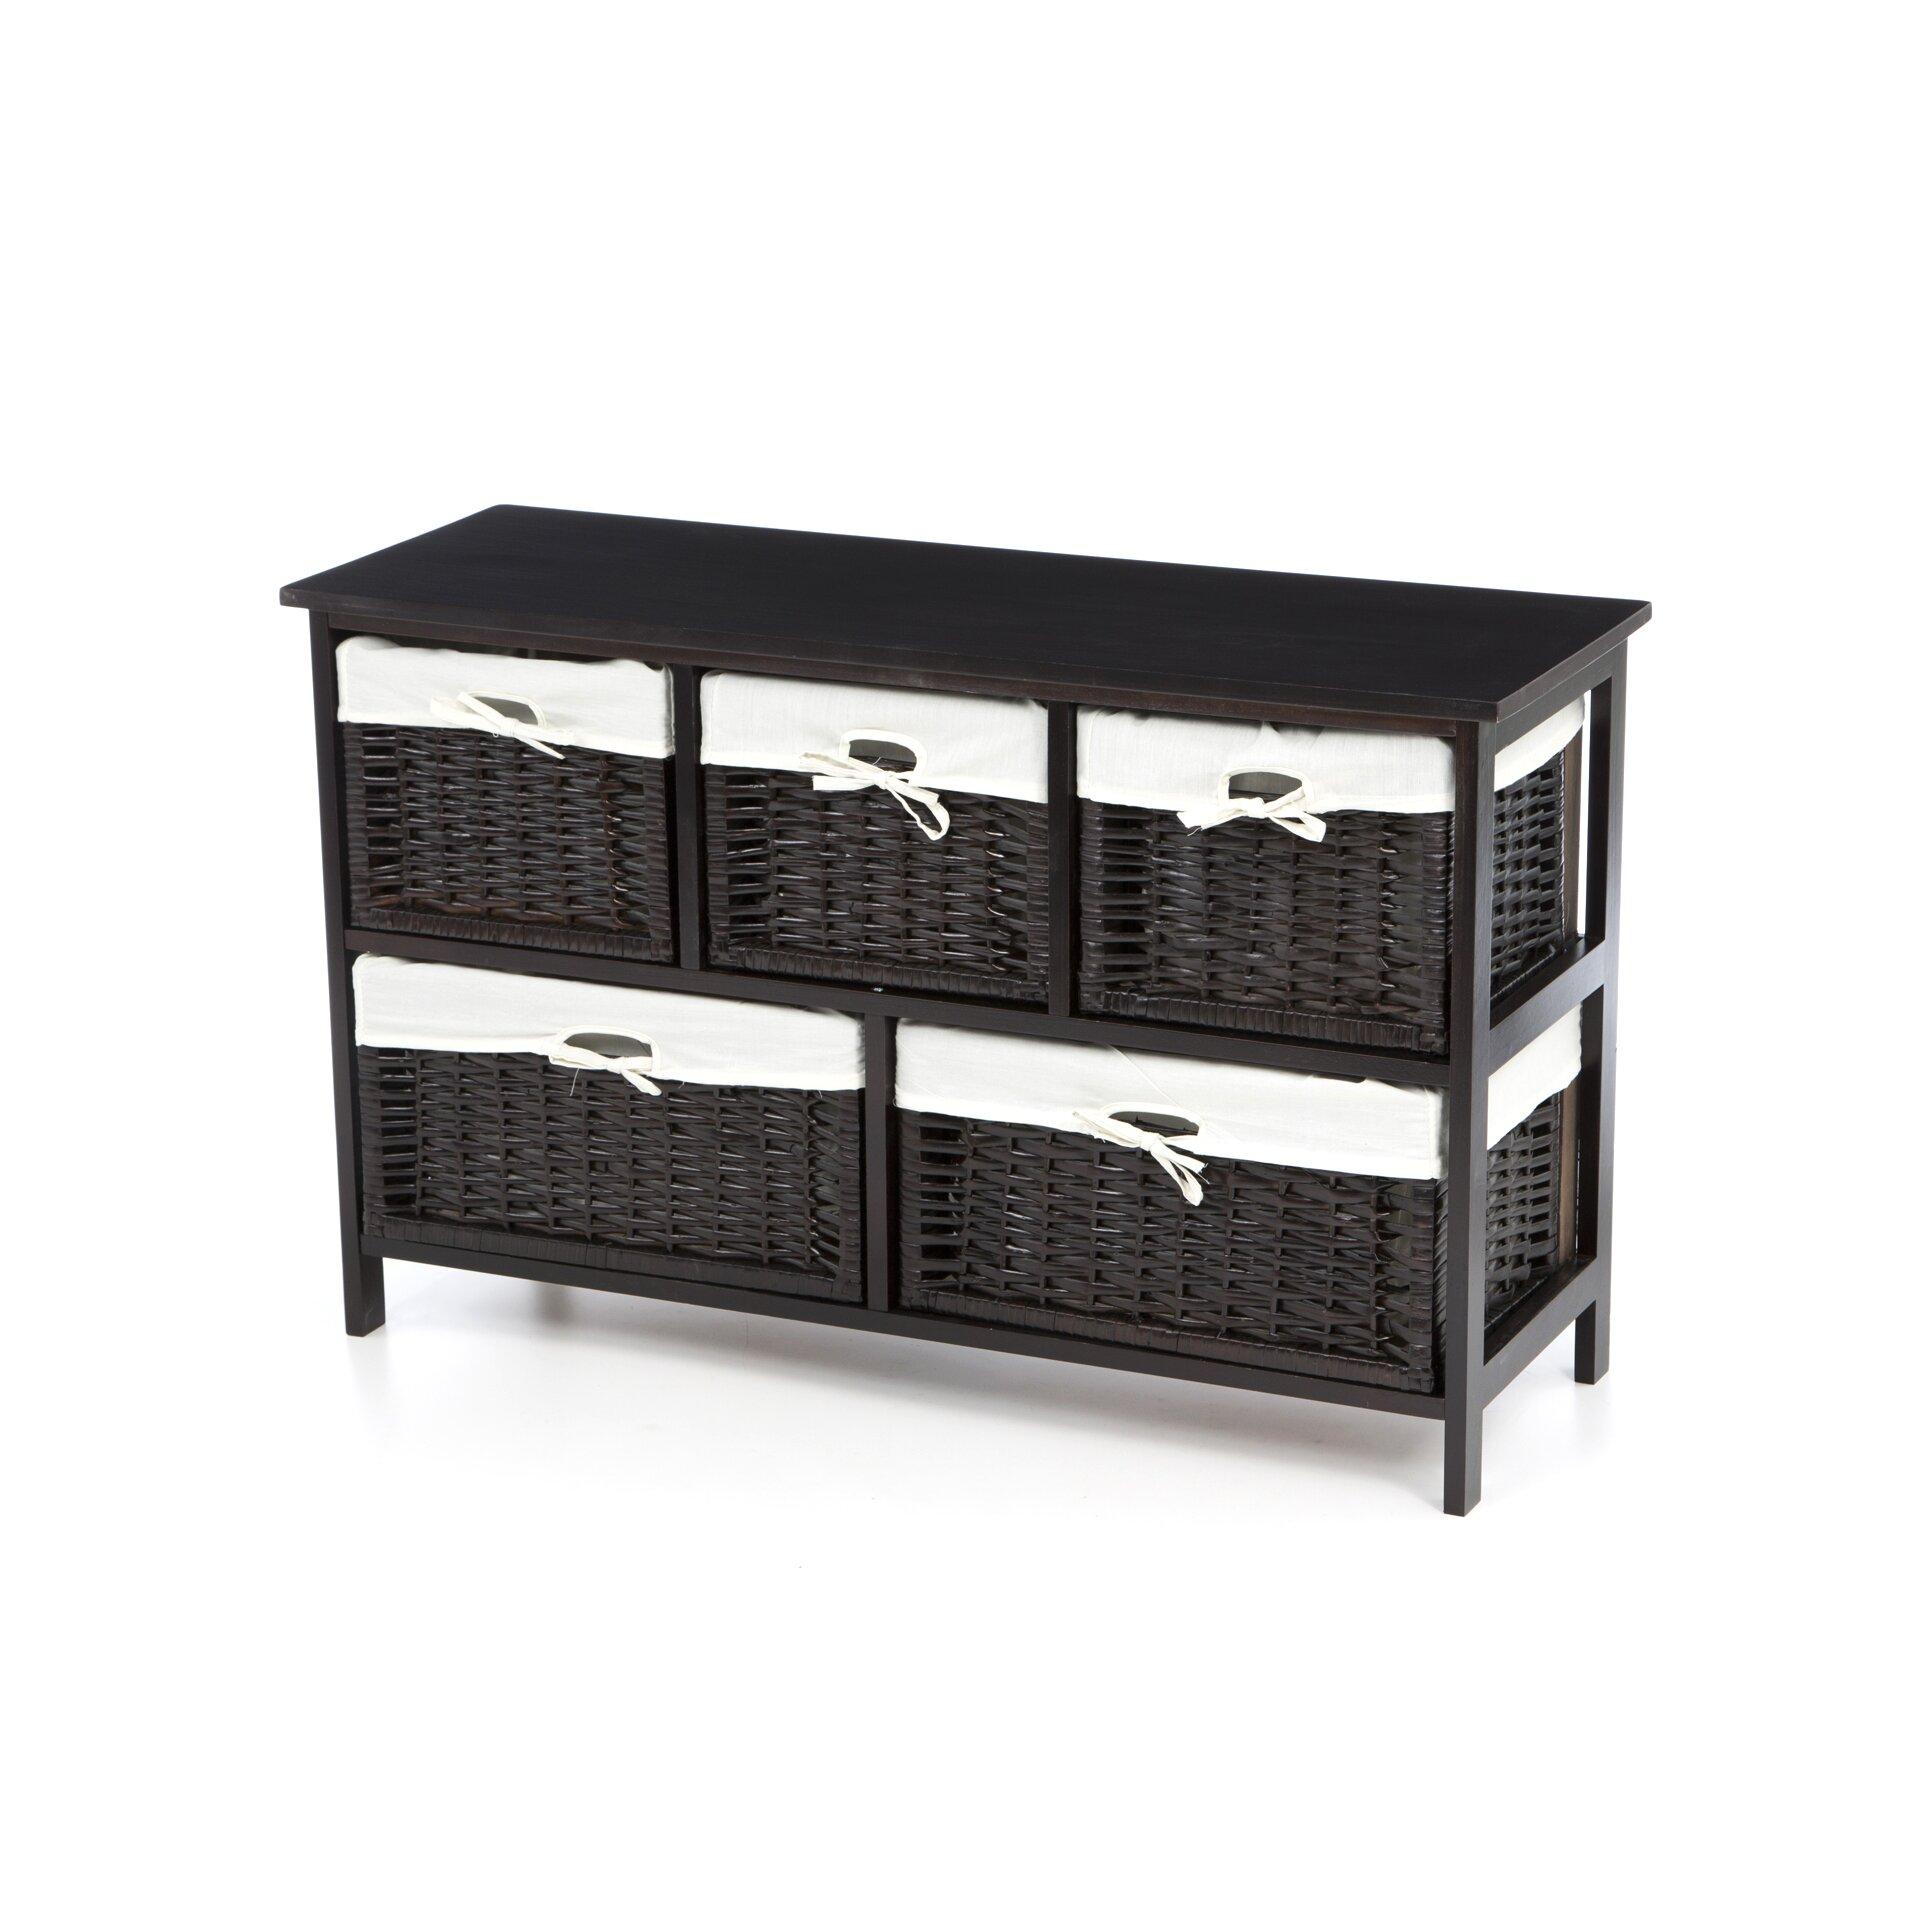 beachcrest home ana chase five wicker basket storage unit in espresso reviews wayfair. Black Bedroom Furniture Sets. Home Design Ideas